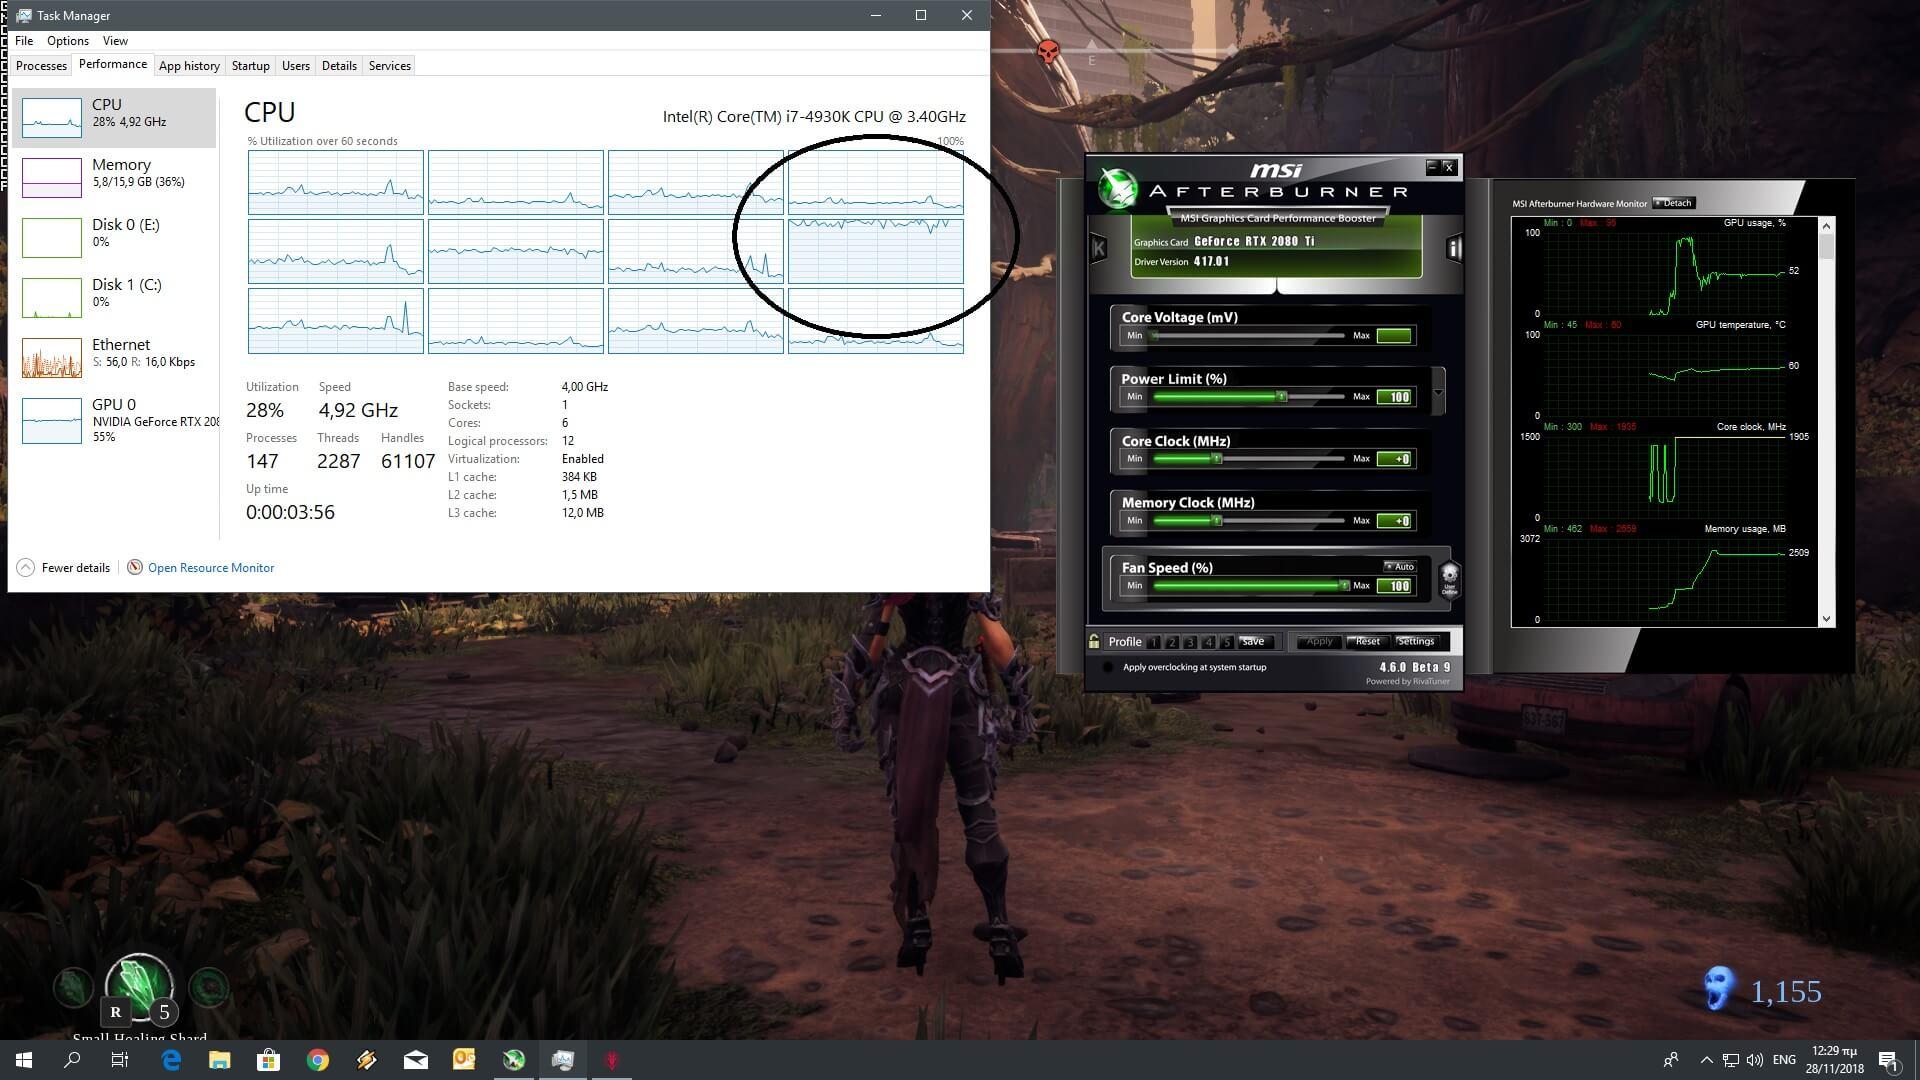 Darksiders 3 PC Performance Analysis - DSOGaming